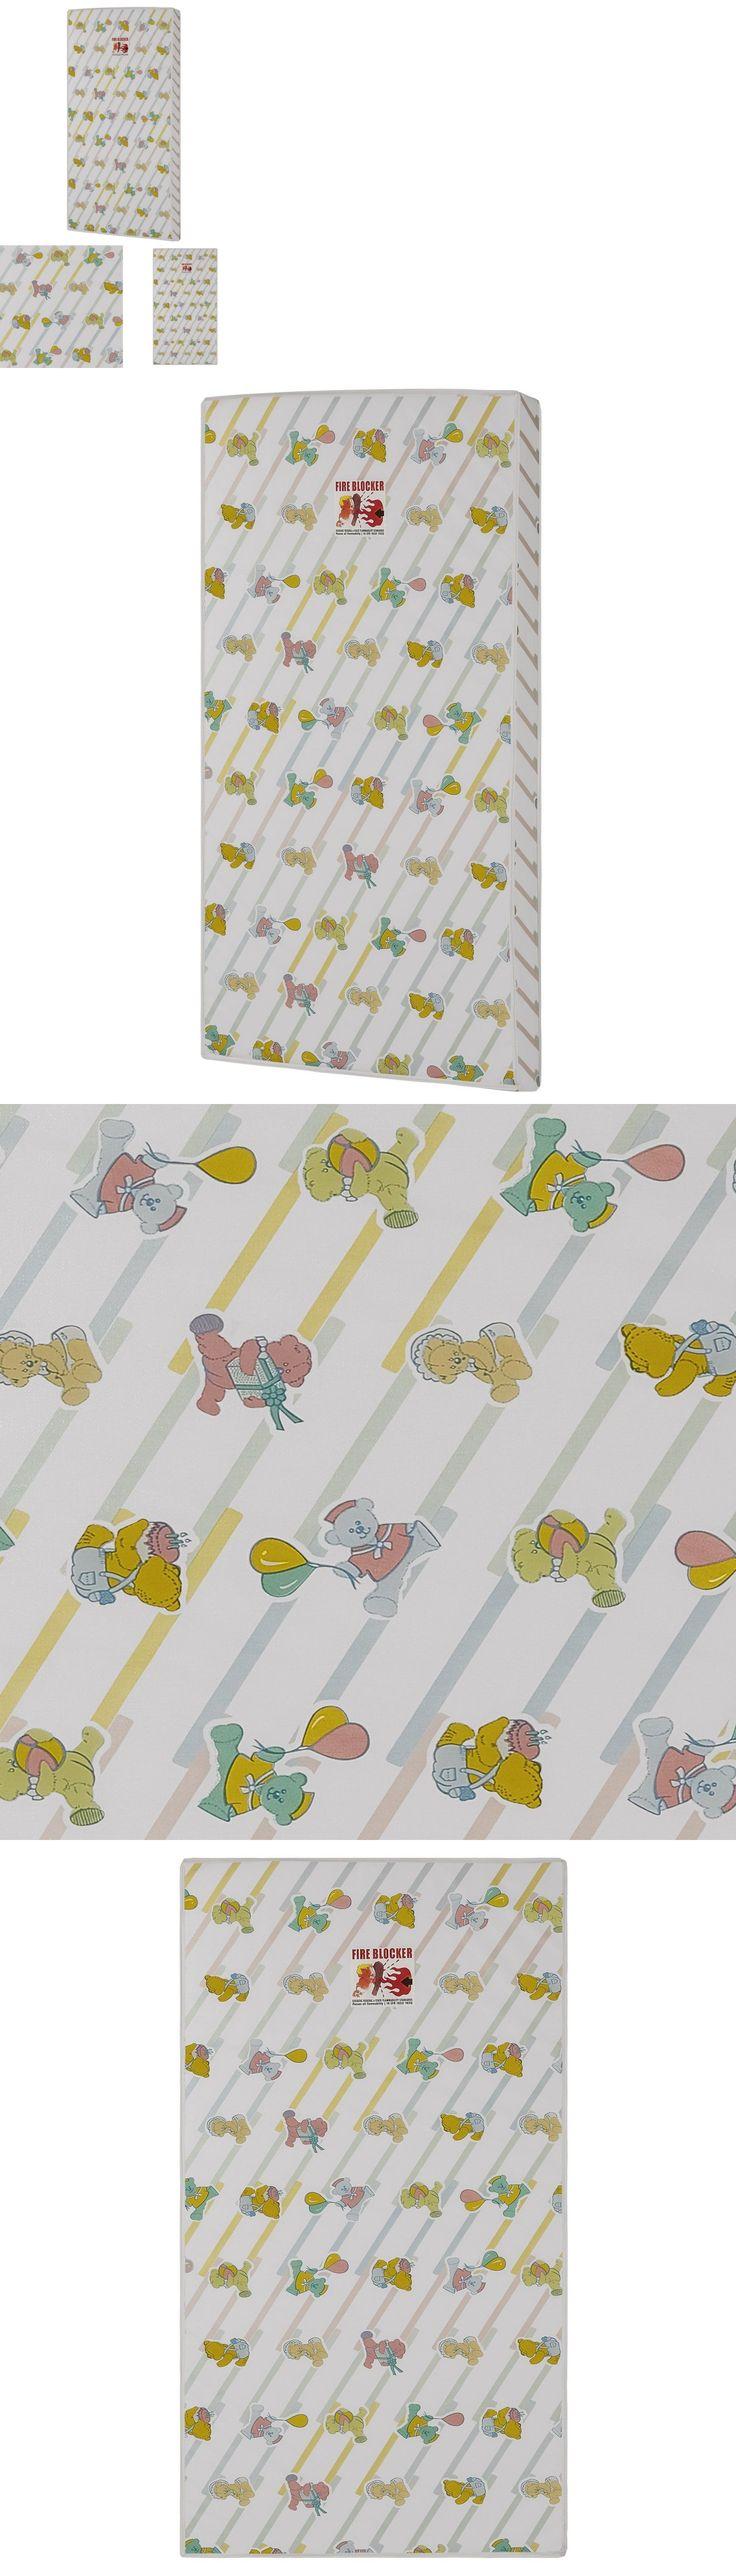 Crib Mattresses 117035: Premium Foam Crib Full Size Baby Toddler Bed Mattress Dream On Me 4 ~ Best Sleep -> BUY IT NOW ONLY: $51.36 on eBay!